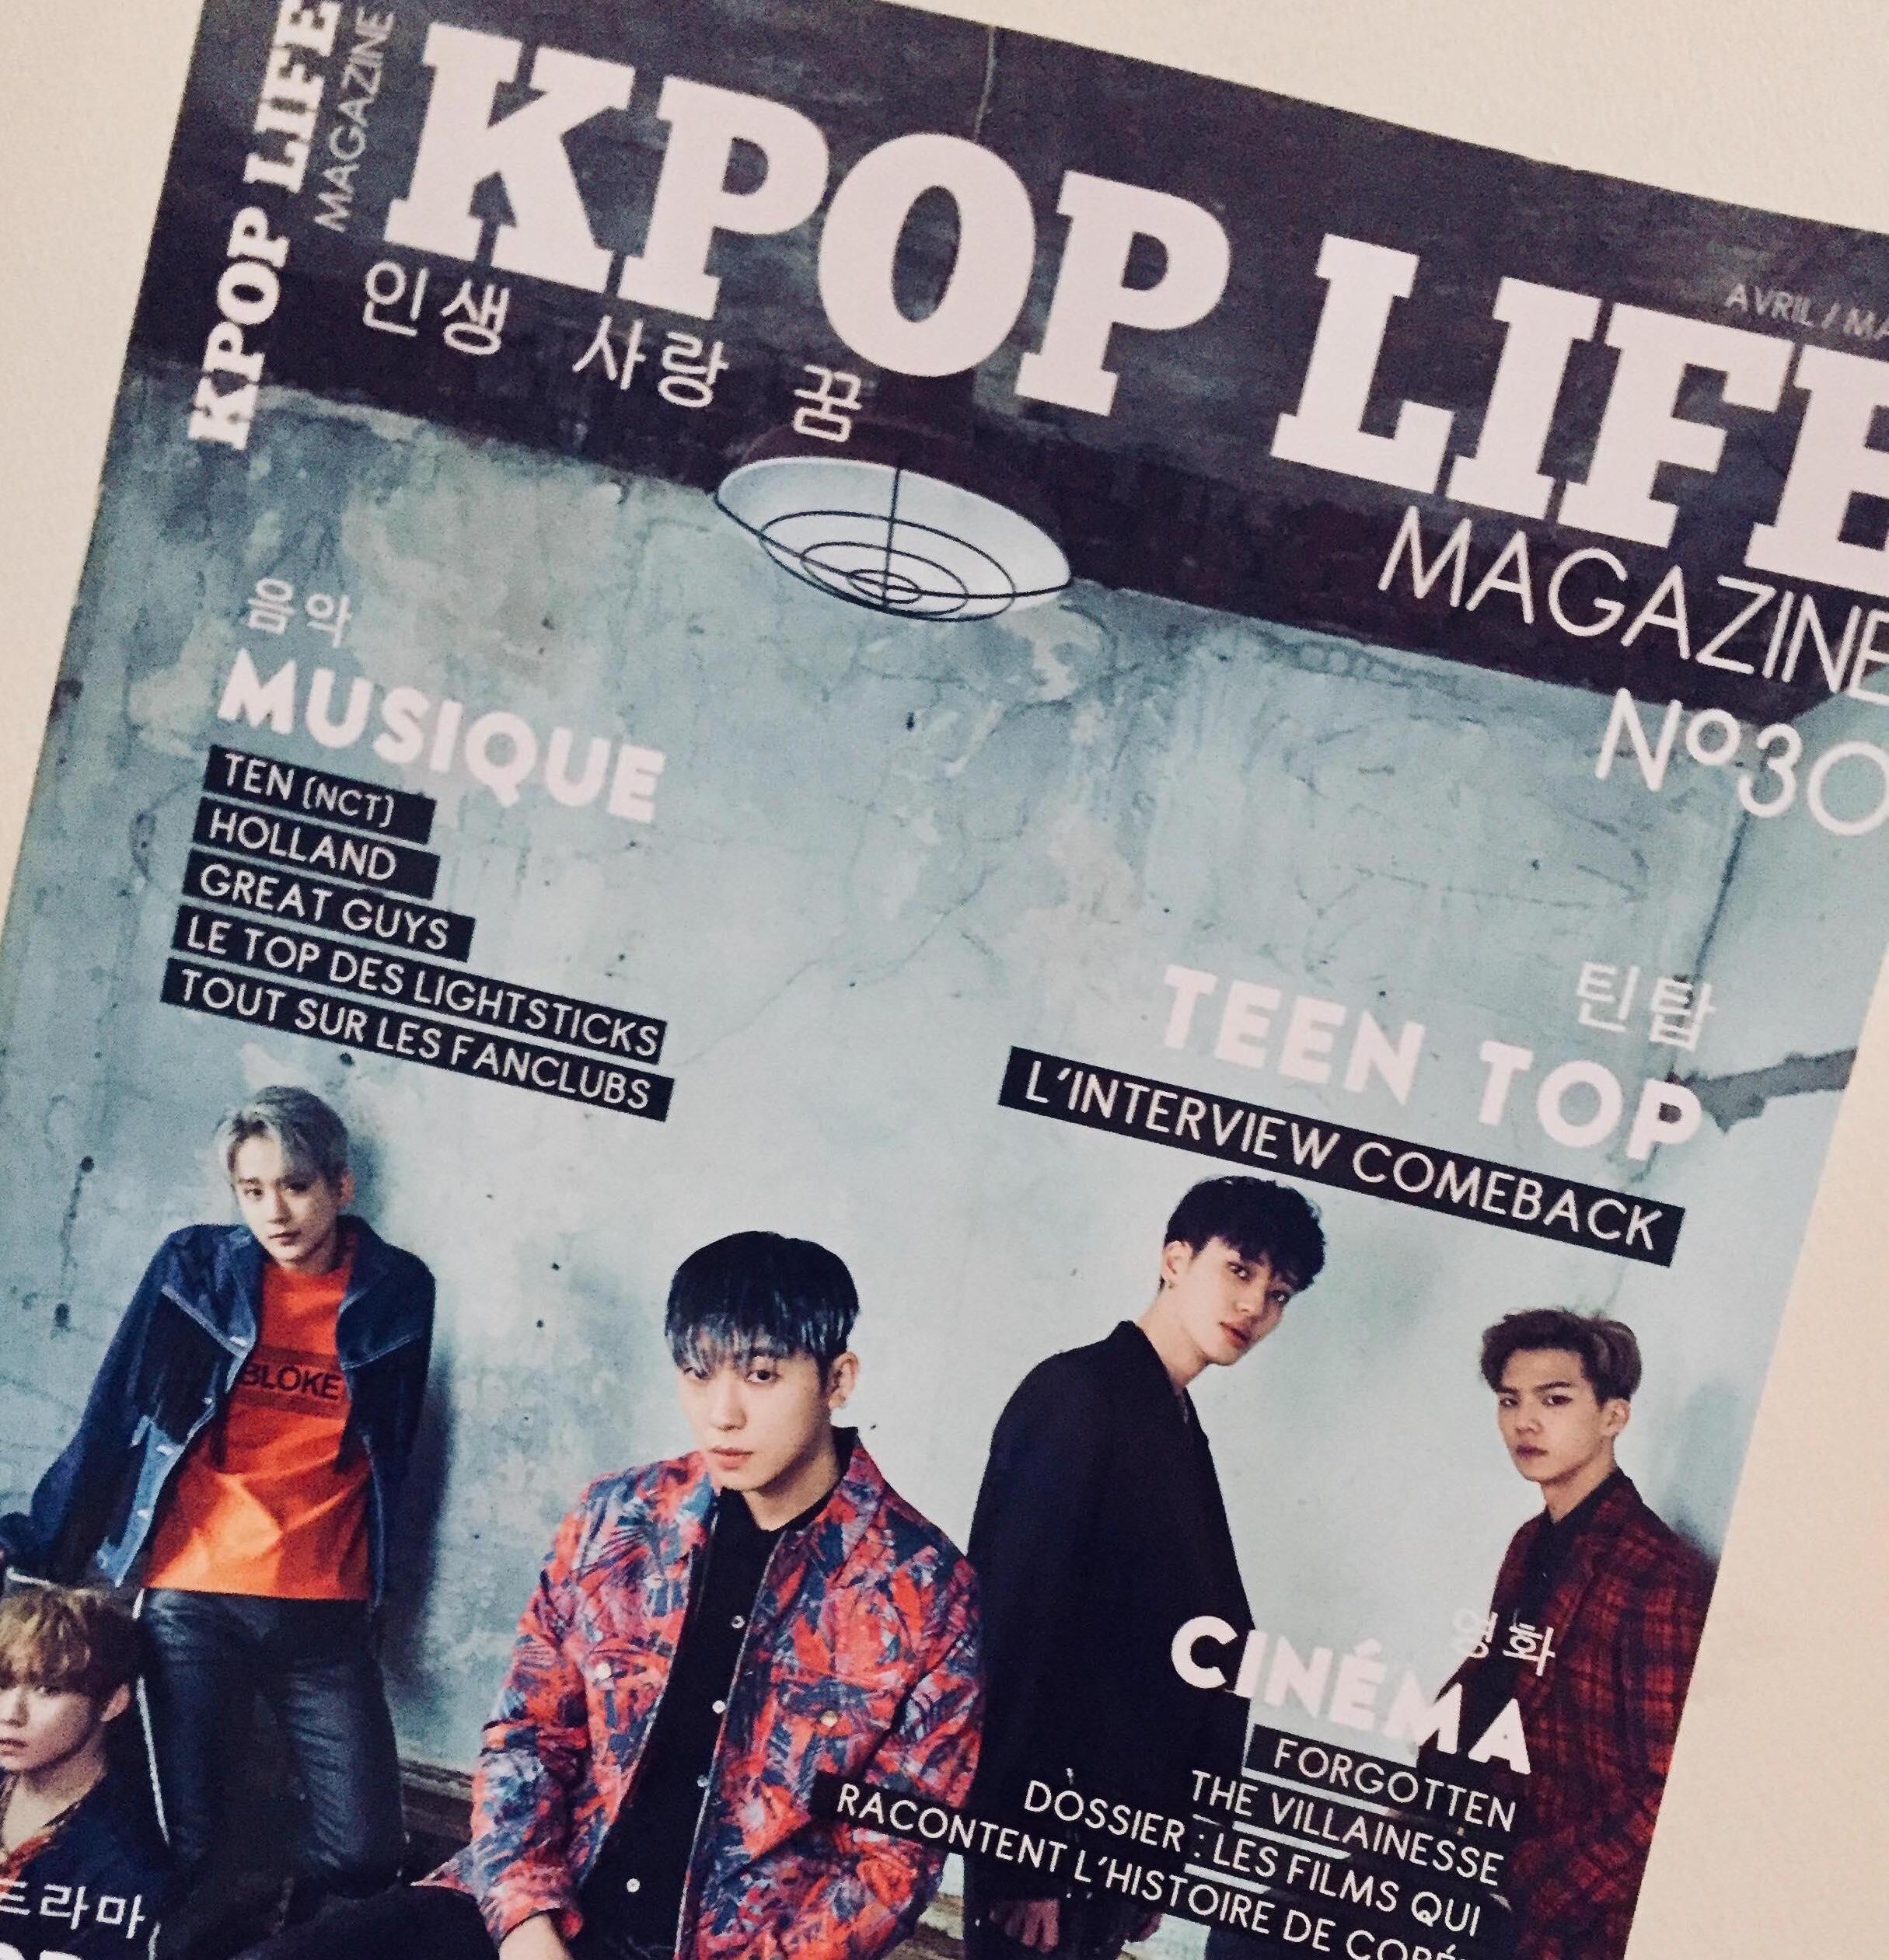 revue de presse - article kpop life magazine